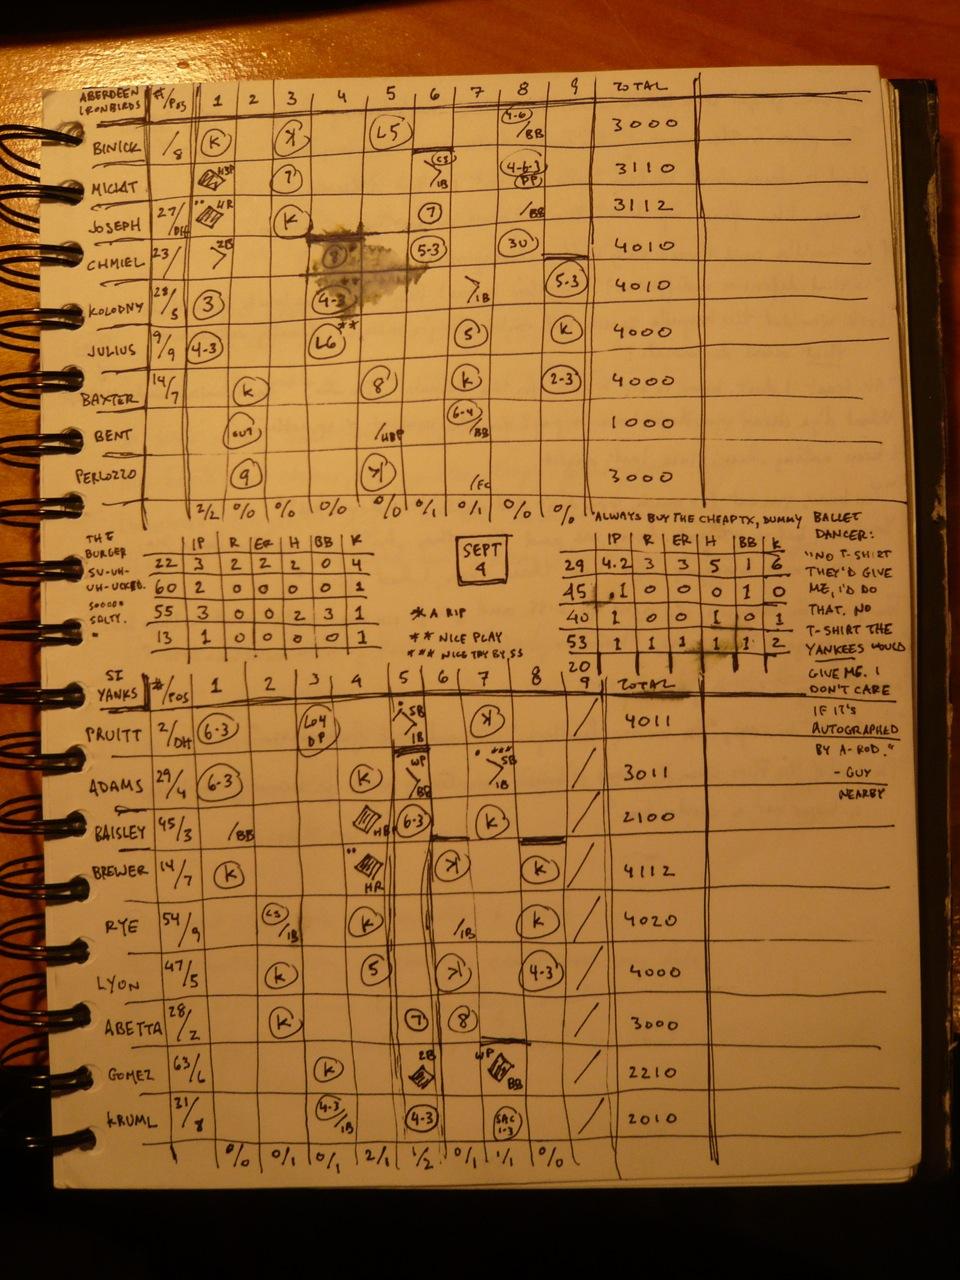 basketball scorebook template Quotes